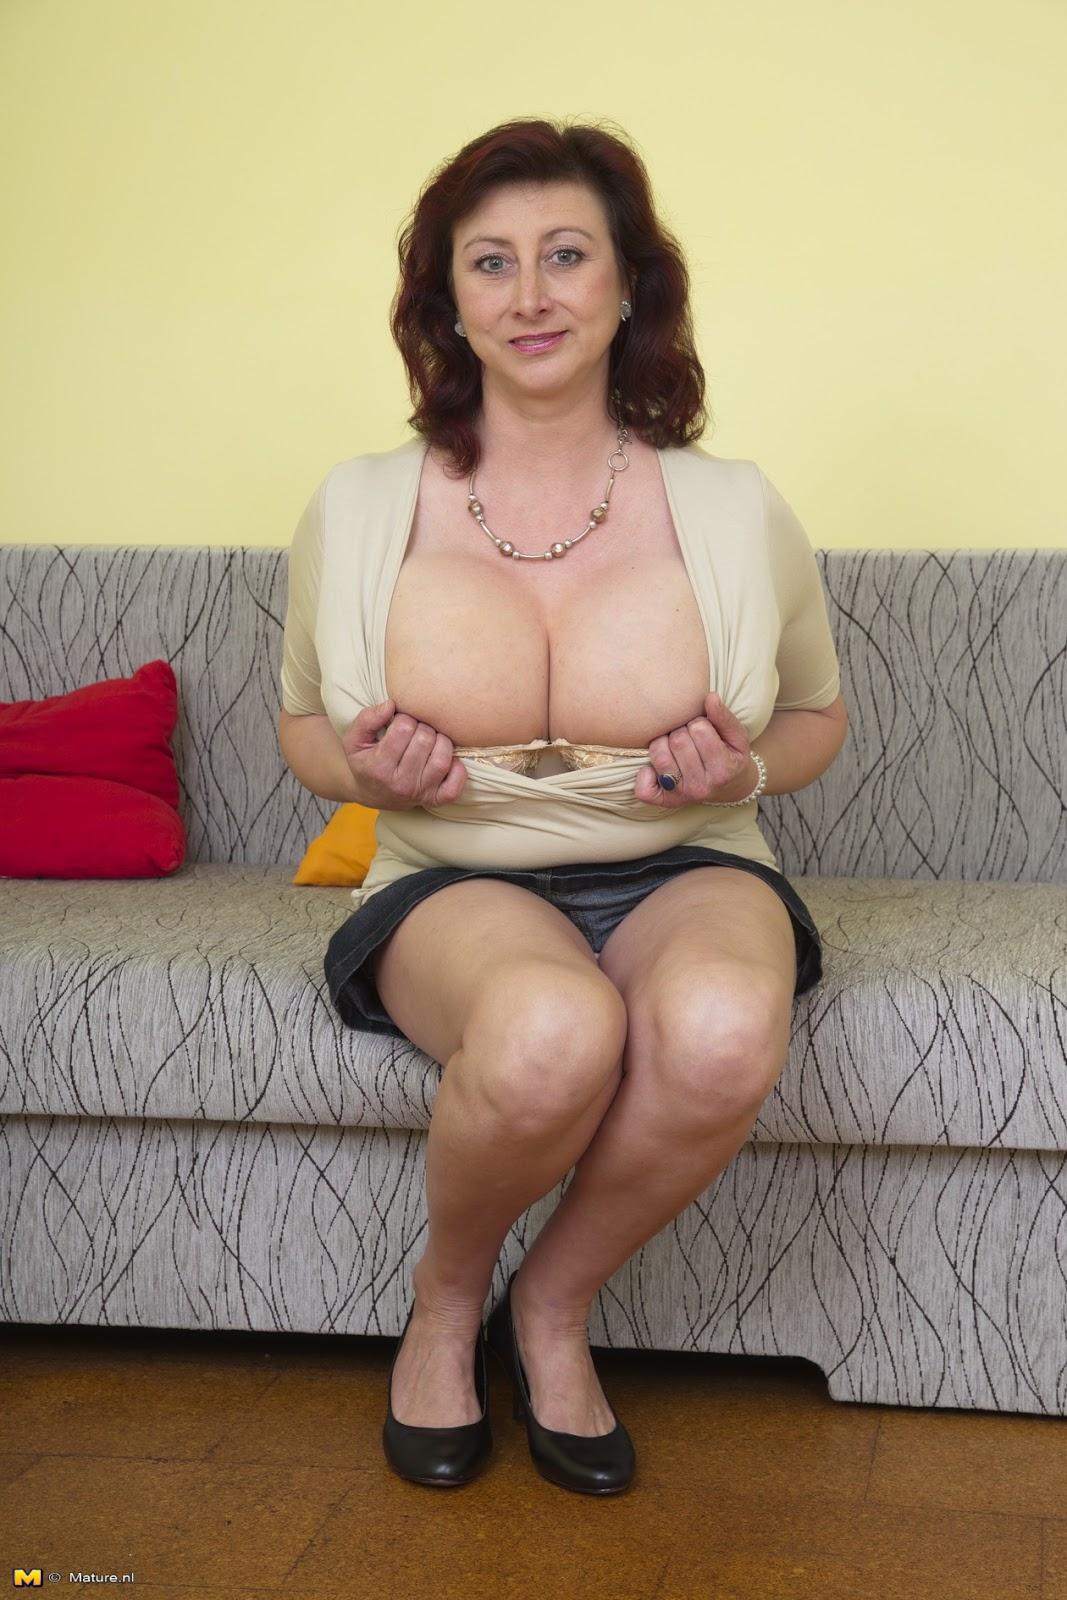 Russian Woman Ru Affiliates 63